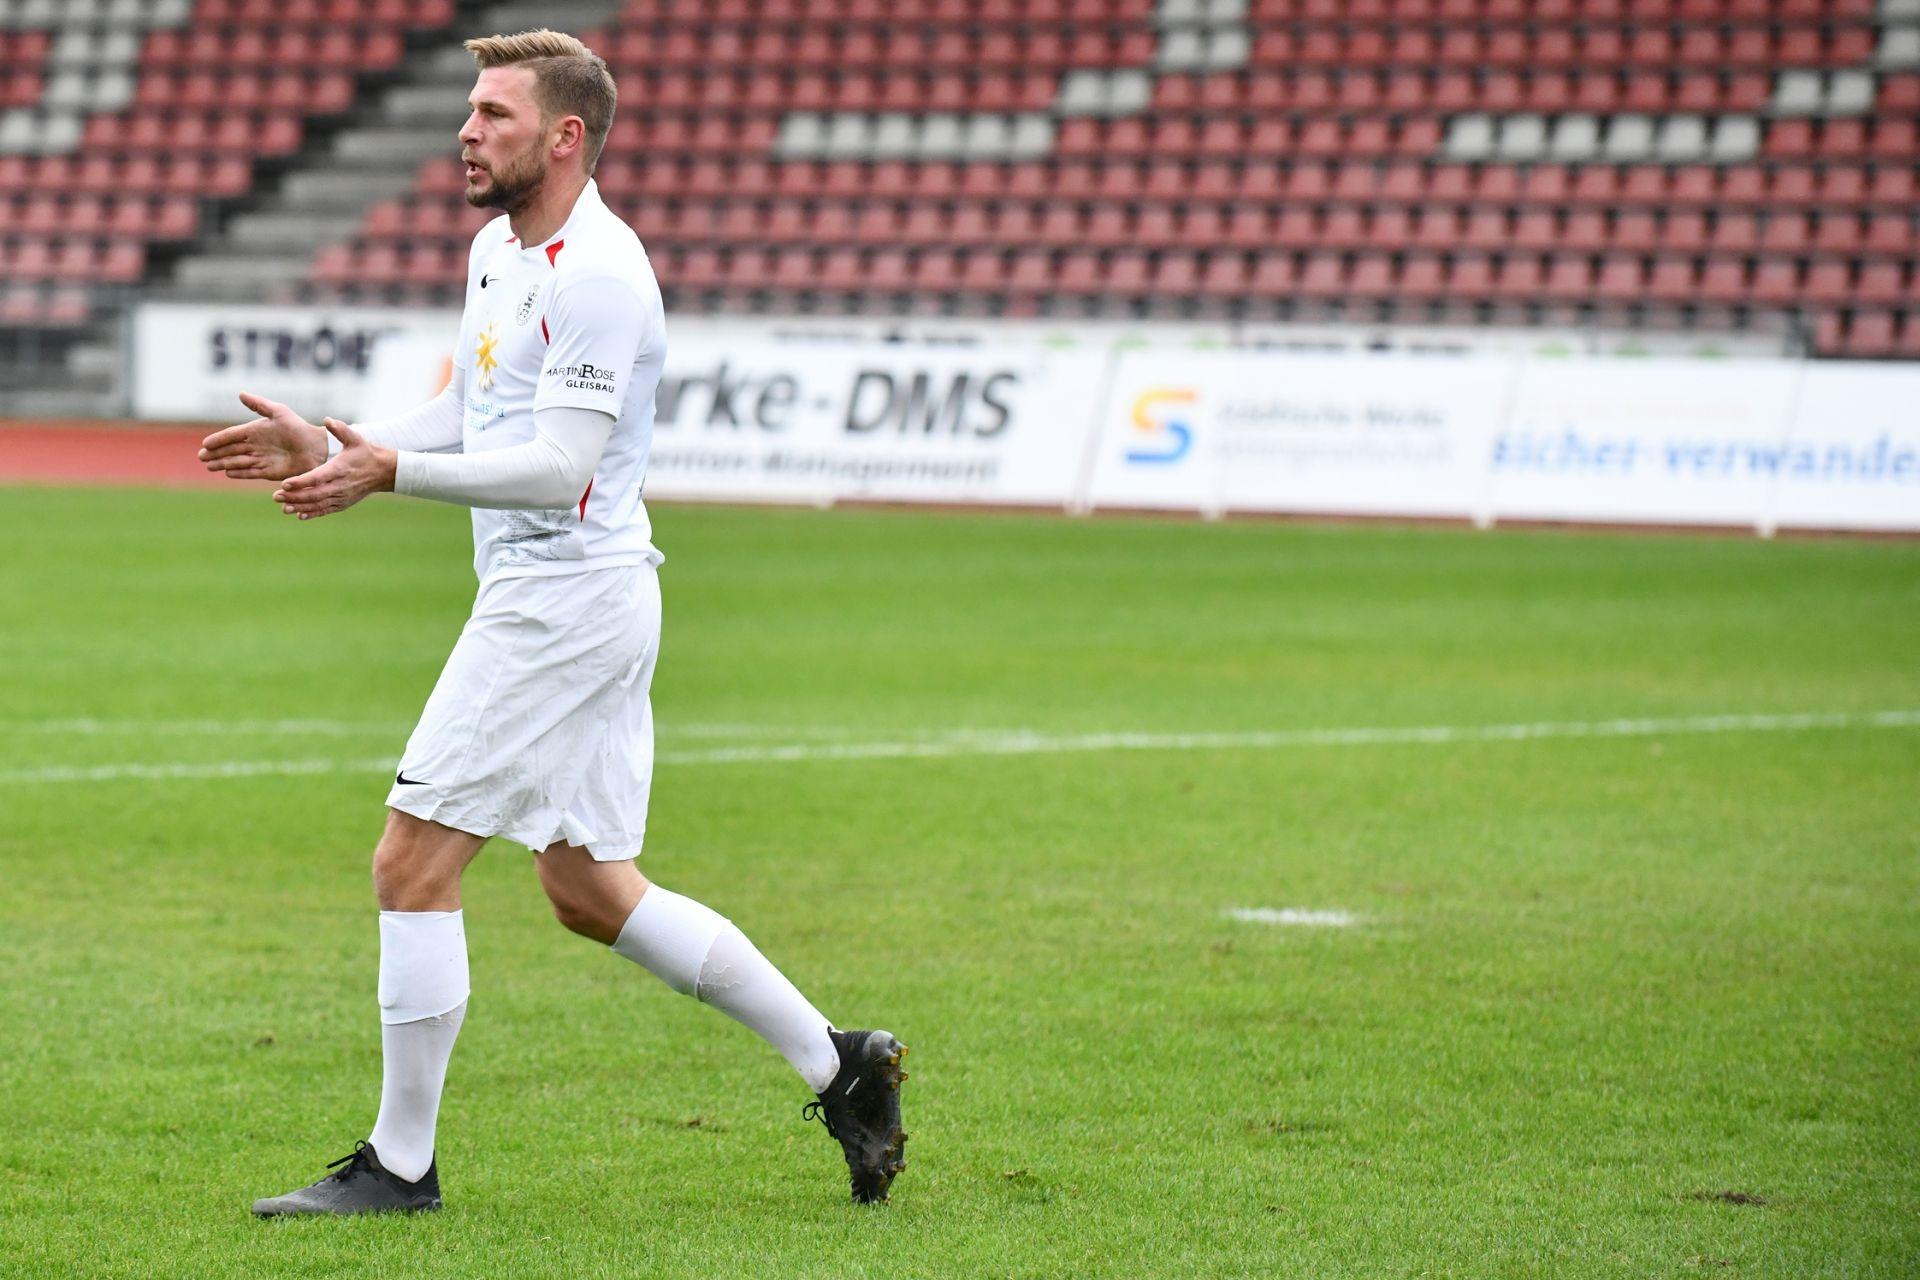 KSV Hessen Kassel, Rot-Weiss Walldorf, Endstand 4:0, Sebastian Schmeer (KSV Hessen Kassel)